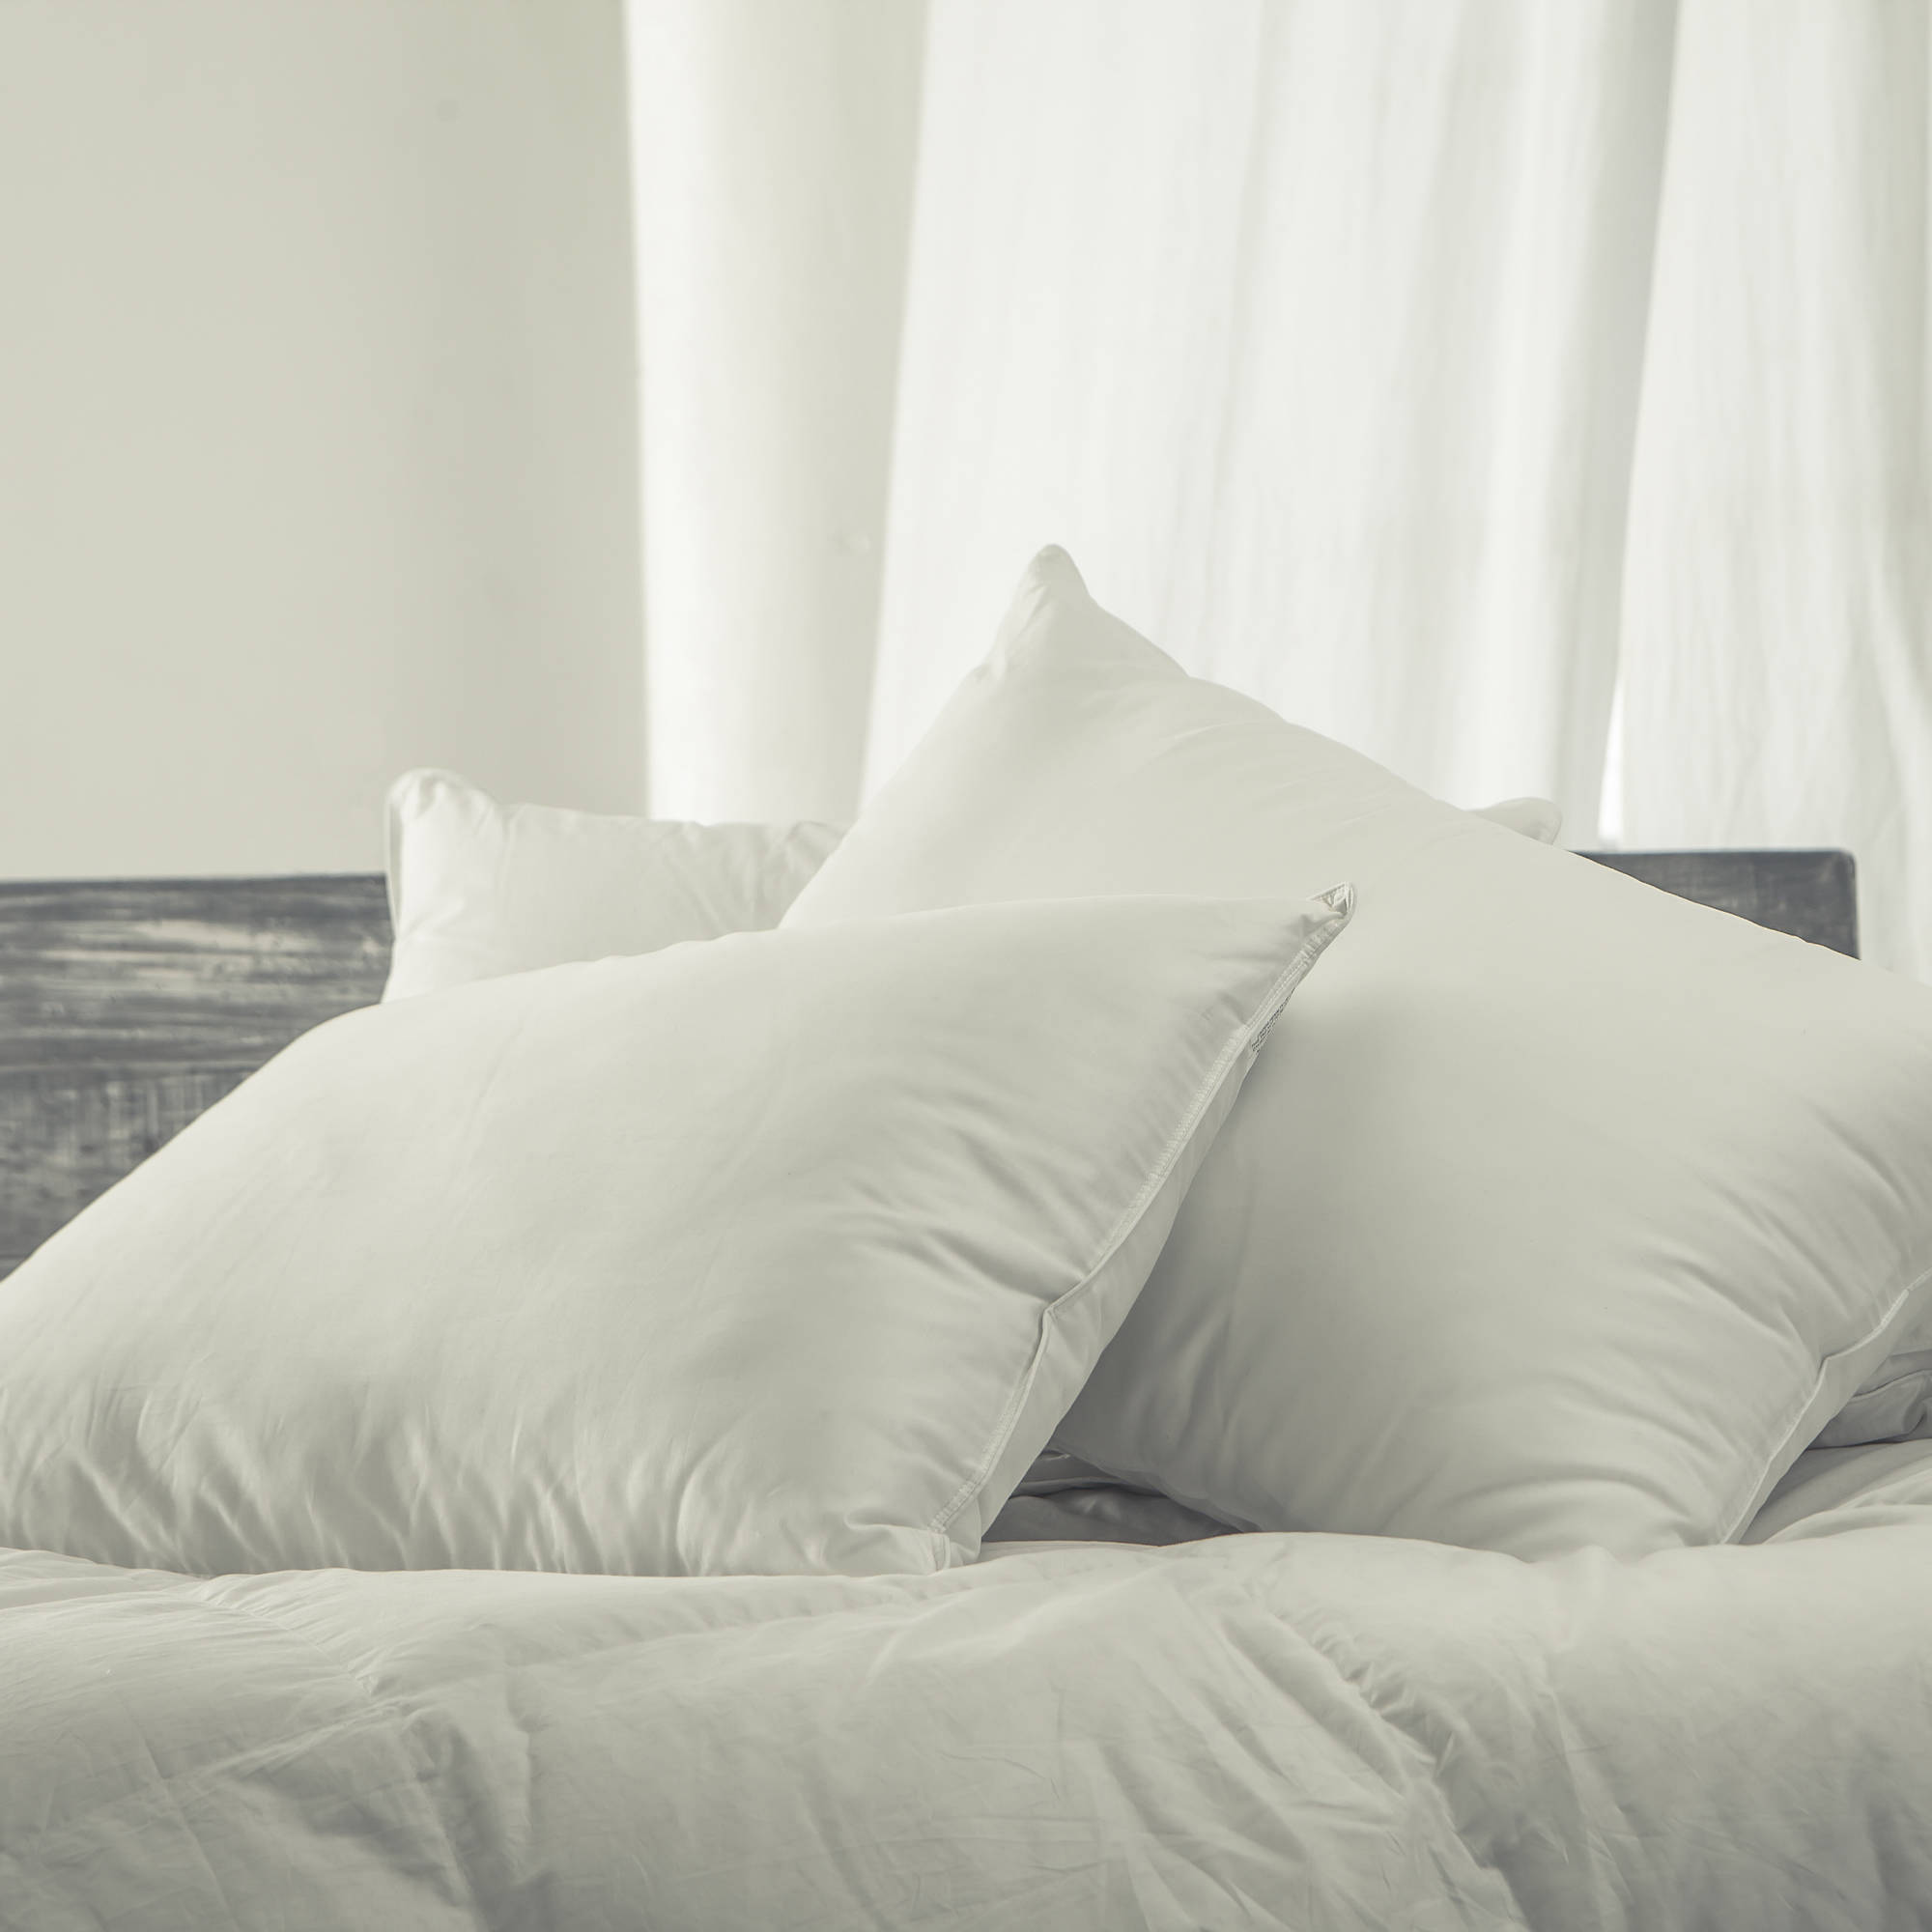 Cozy Classics Dacron Comforel Silky Firm Down Alternative Pillows, 2pk